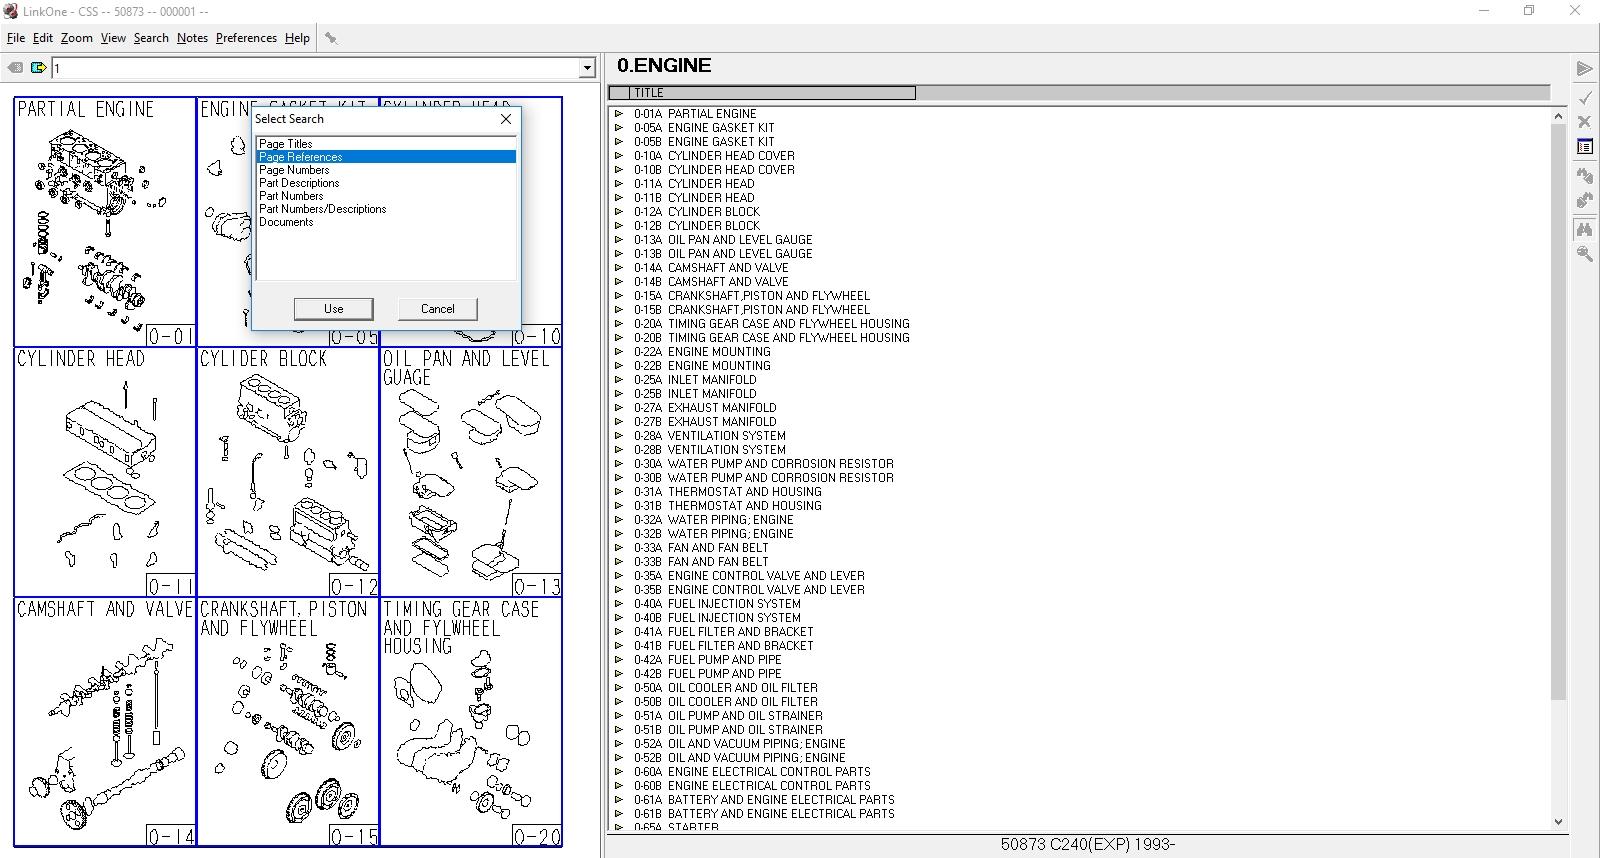 ISUZU_CSS-NET_EPC_052020_Electronic_Parts_Catalog_8